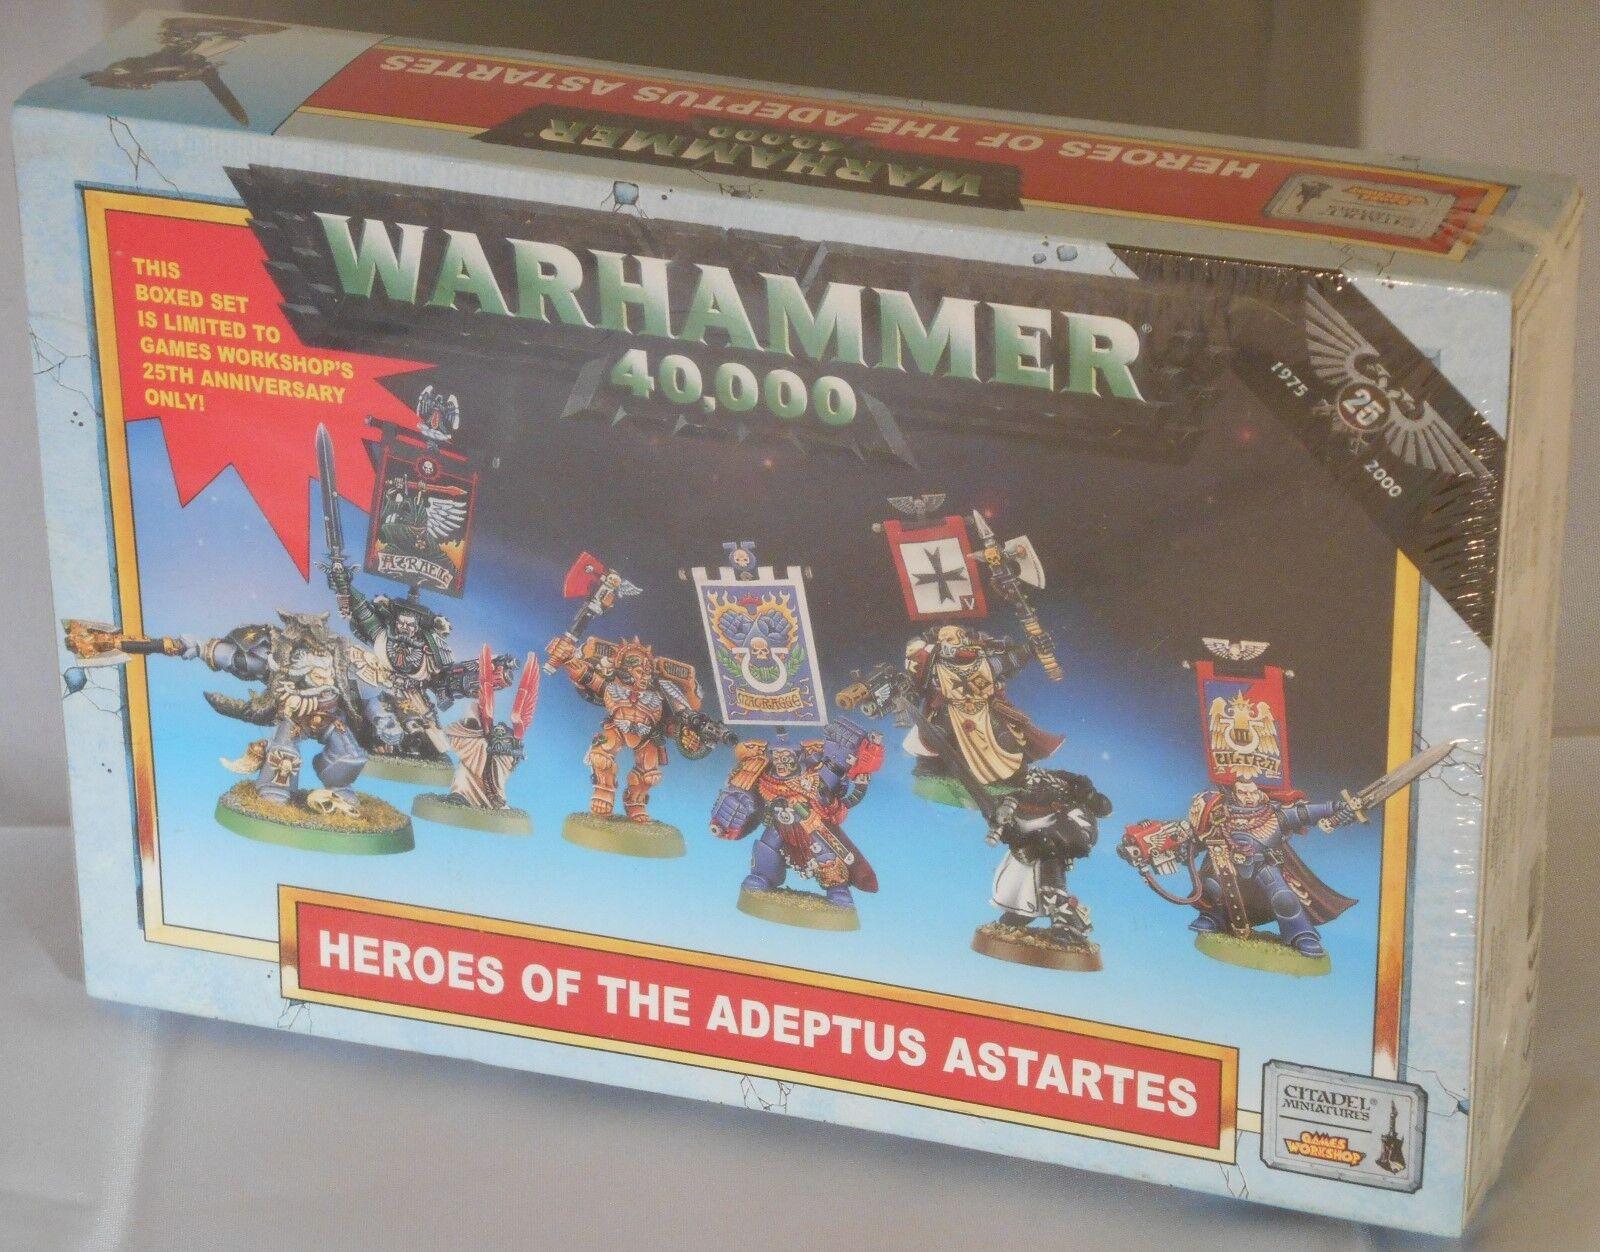 incentivi promozionali Heroes of the Adeptus Aestrellates - Ltd ed - - - 25th Anniversary - OOP, MIB - c. 2000   esclusivo